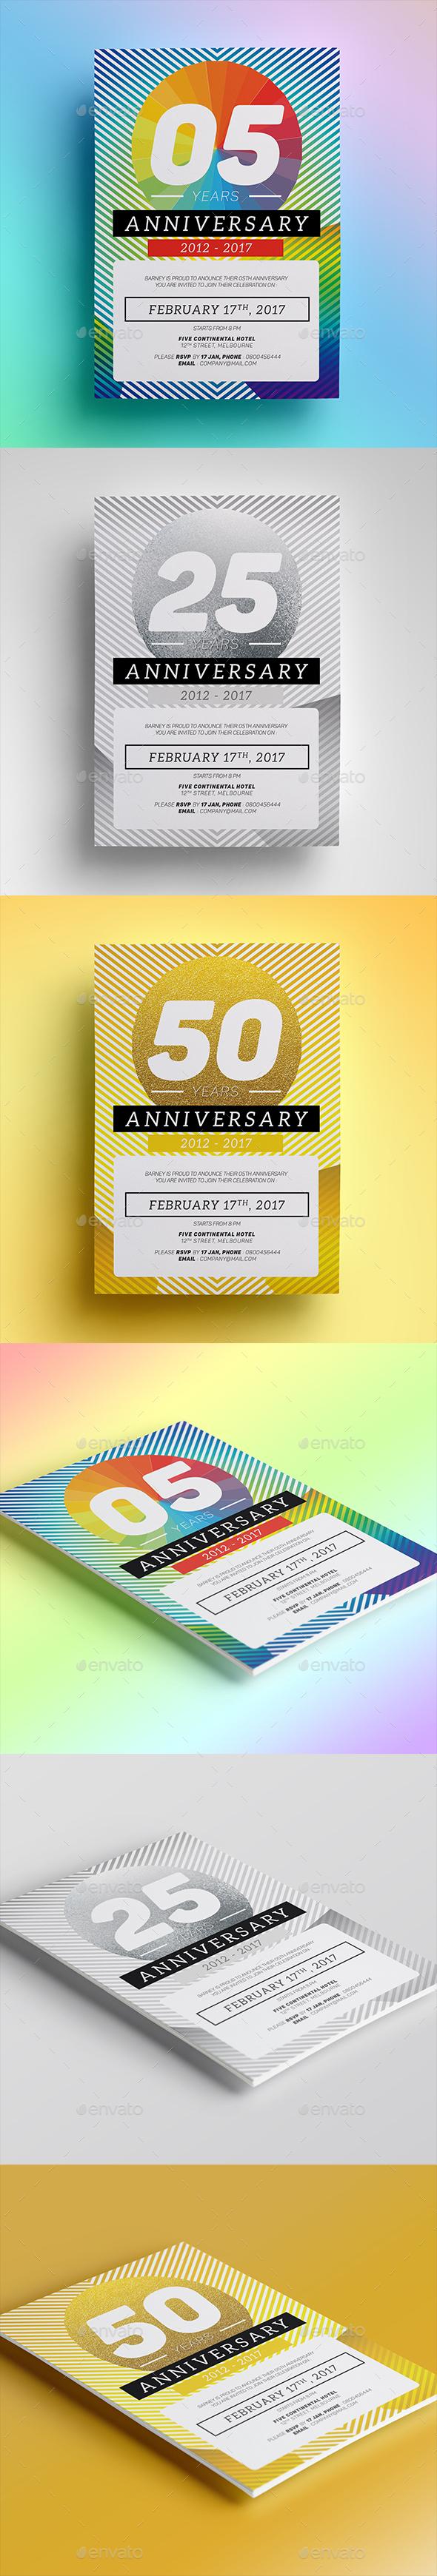 Anniversary Invitation 02 - Anniversary Greeting Cards